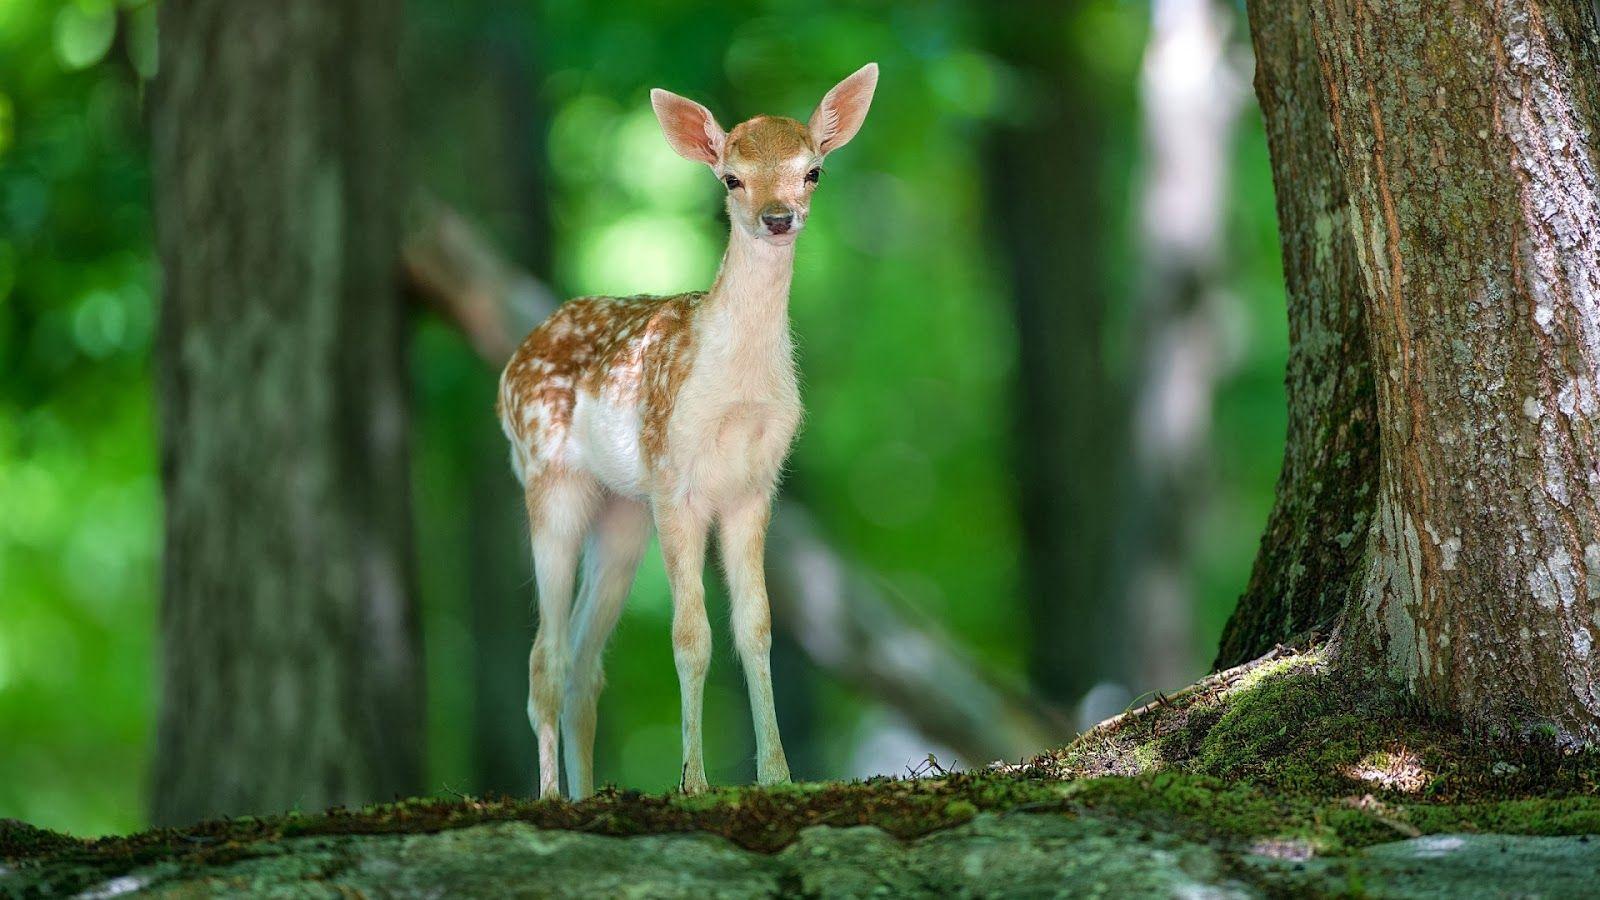 Deer In Jungle Deer Wallpaper Cute Animals Animals Beautiful